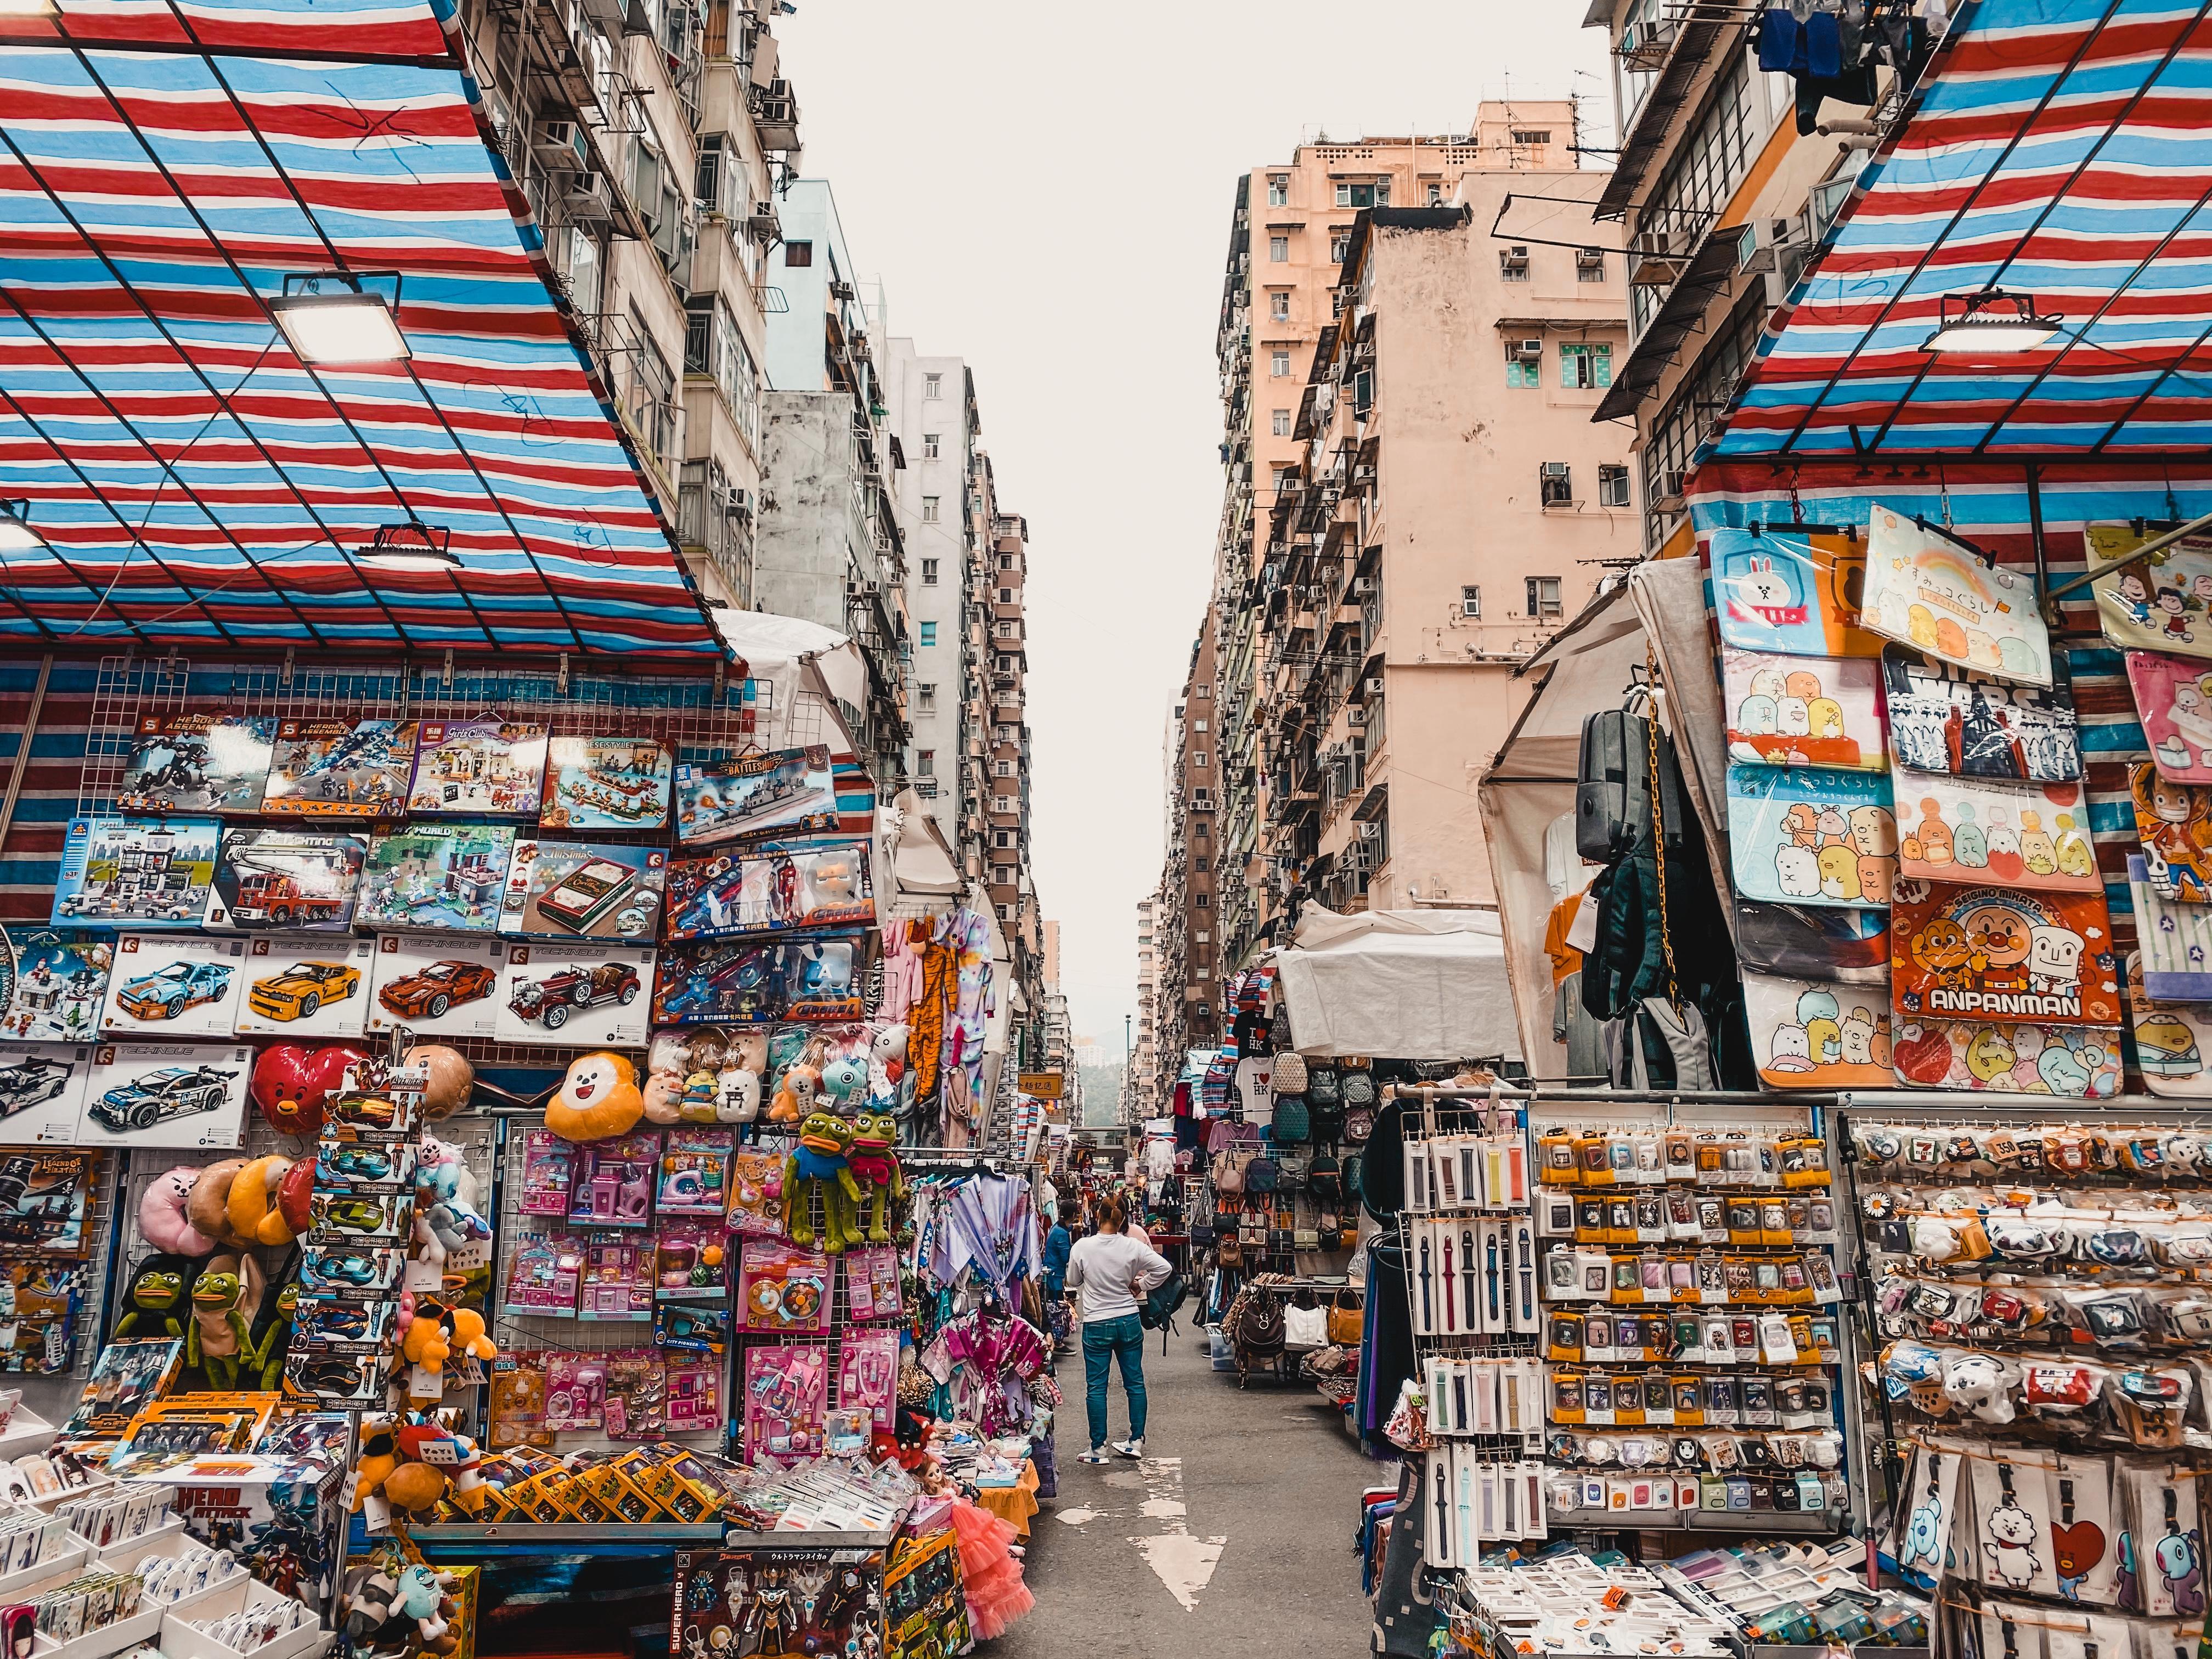 Mong Kok ladies market souvenirs